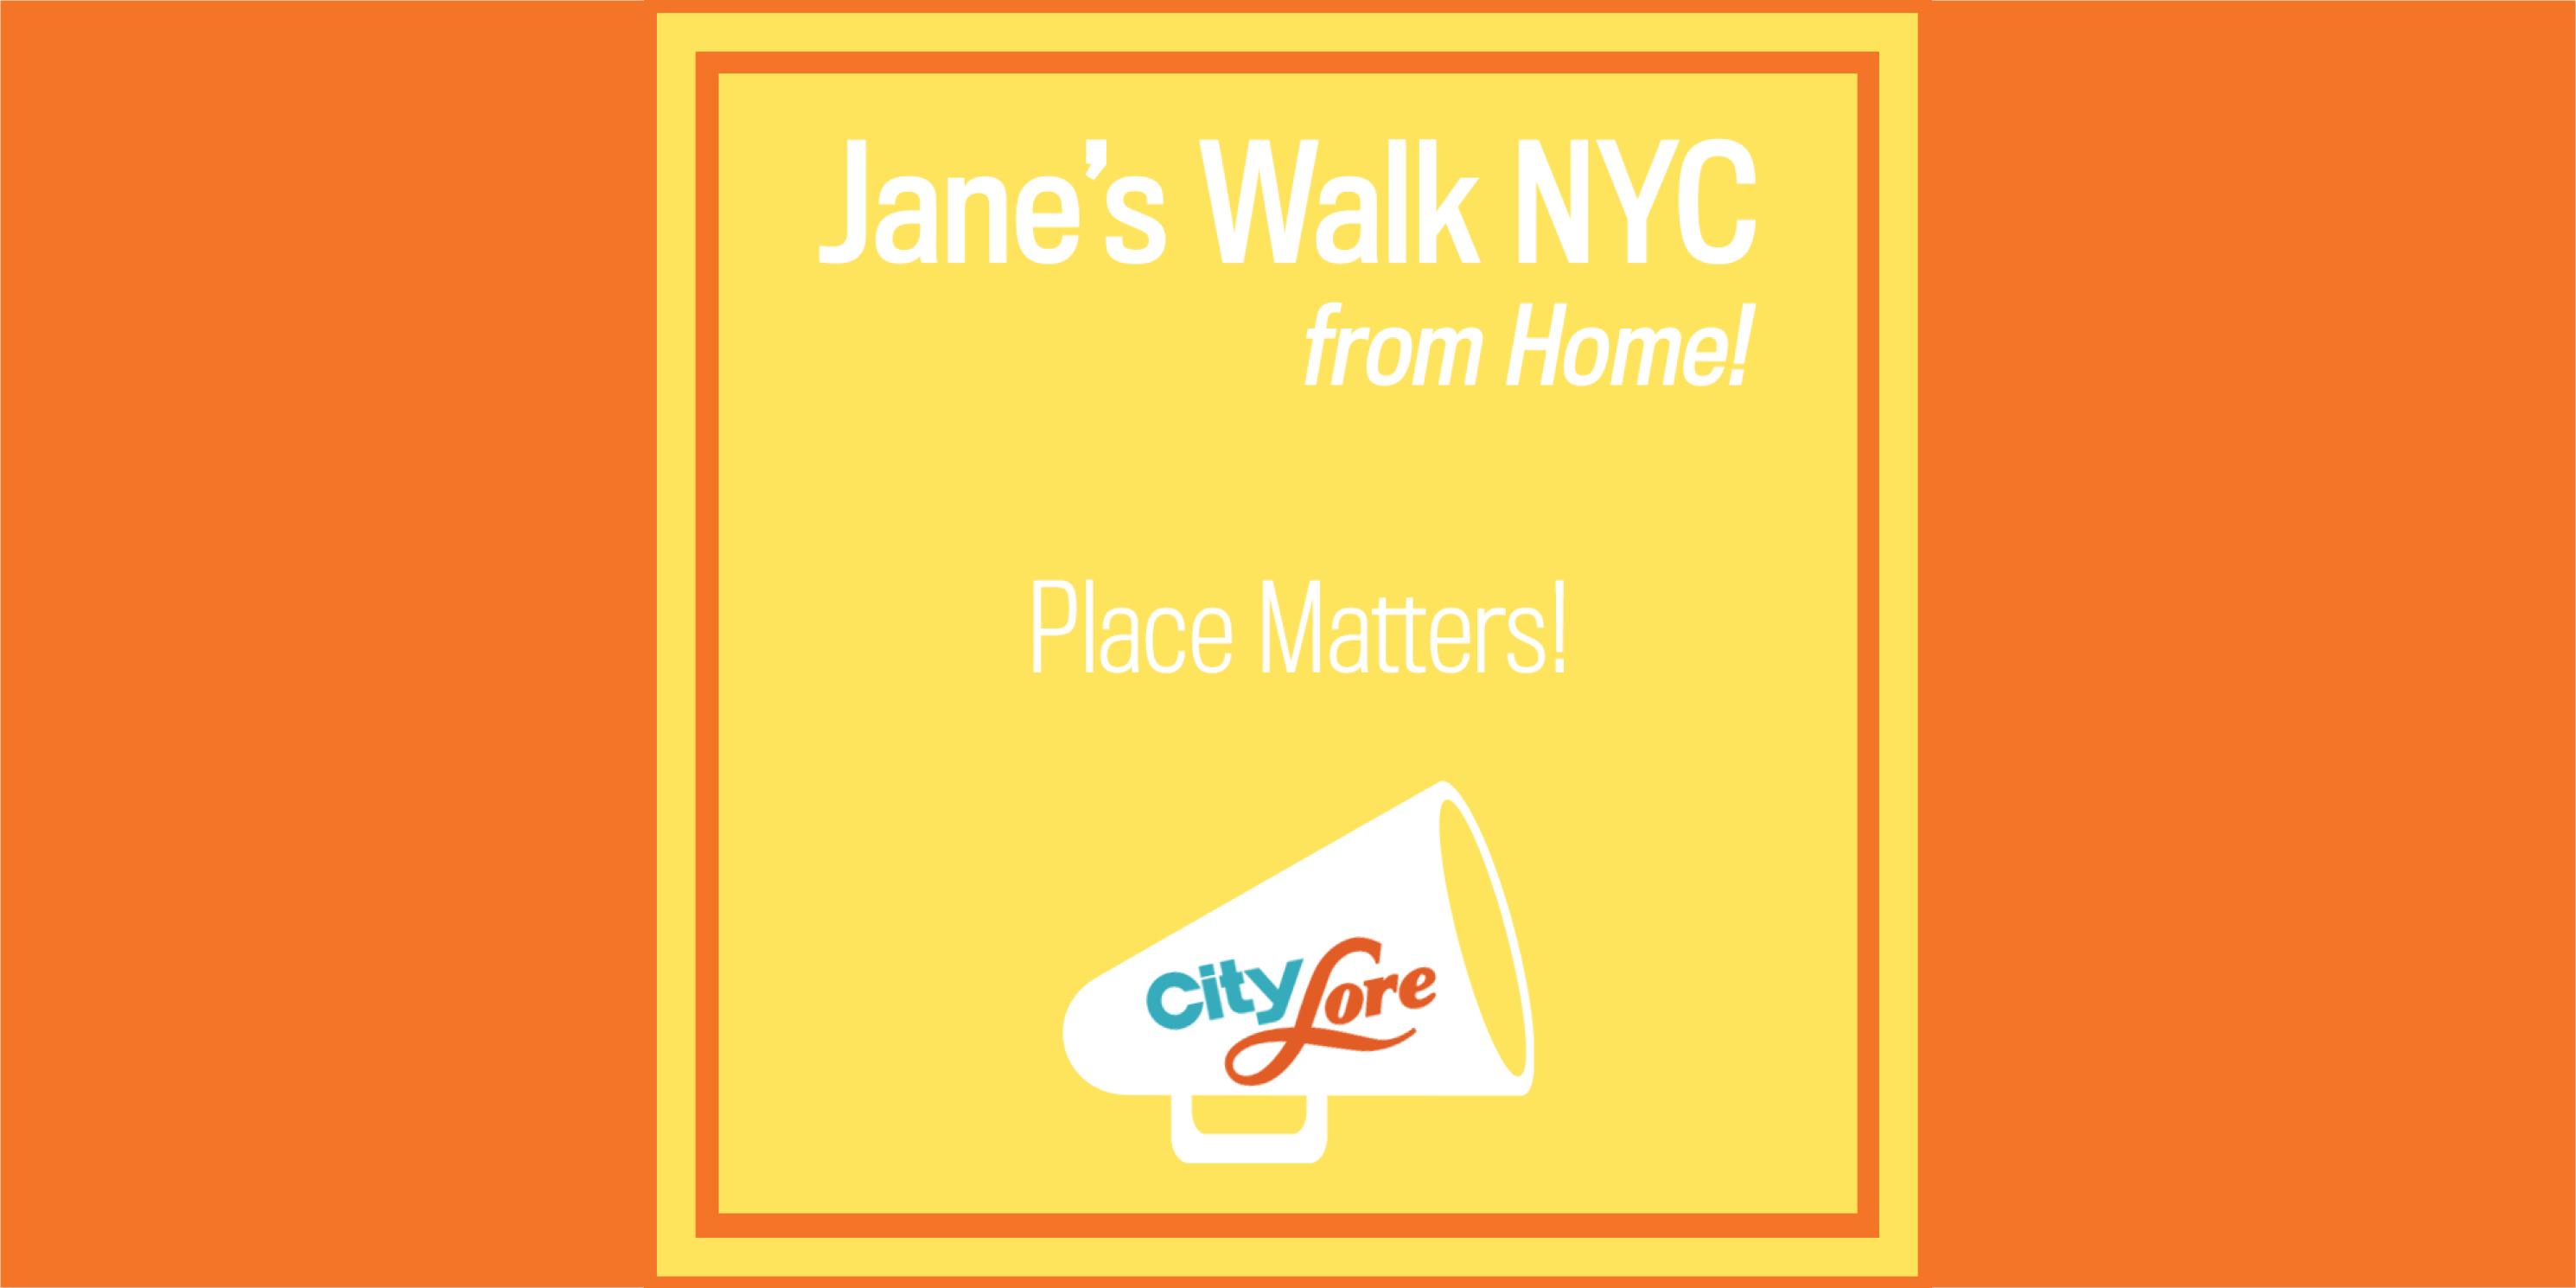 Advertisement for Jane's Walk 2020, Day 2 activities